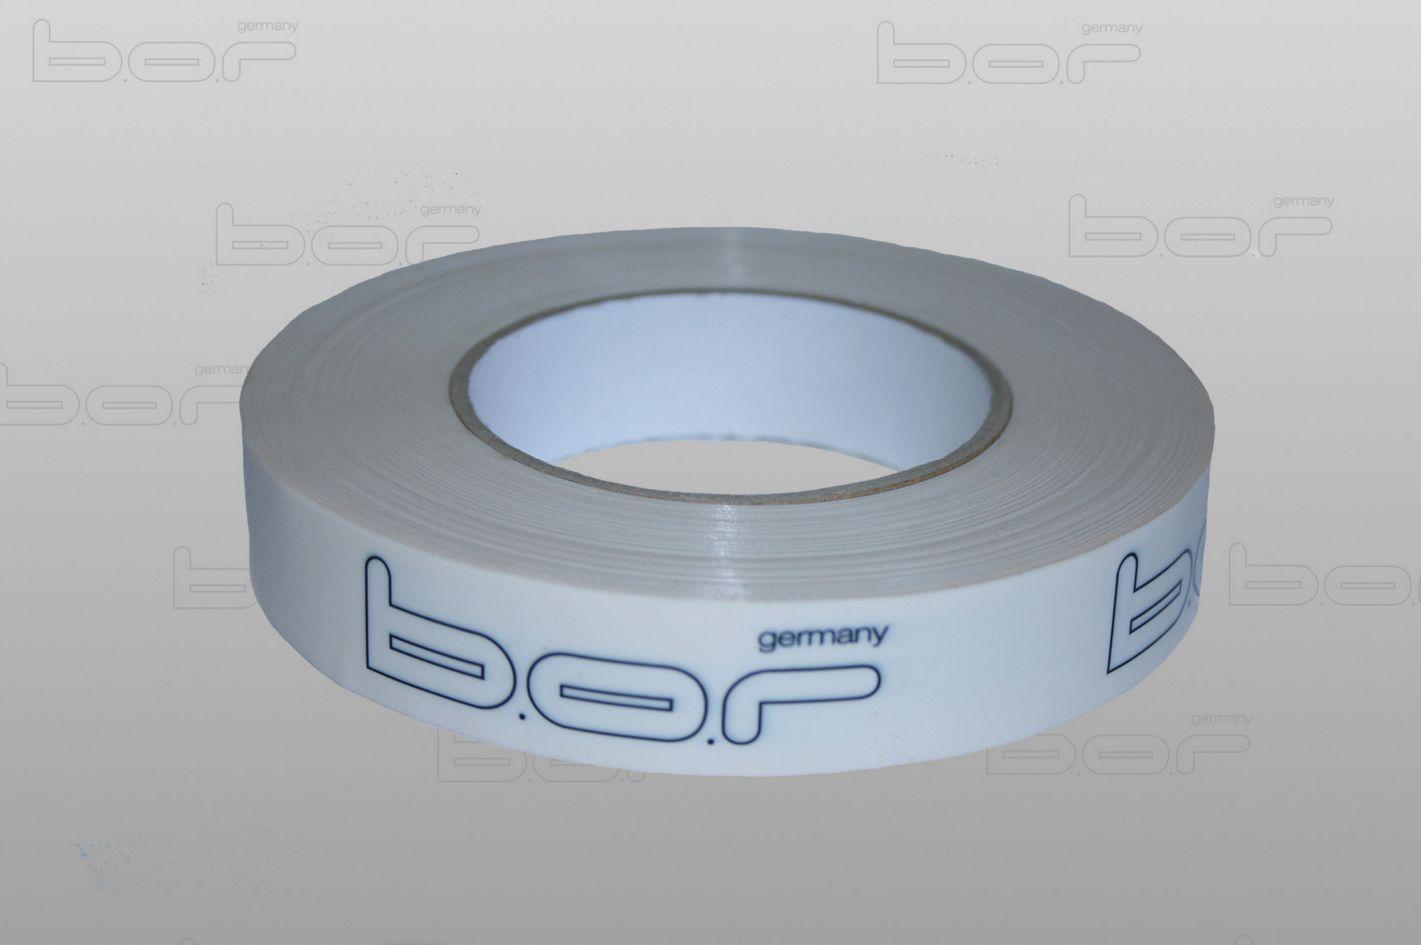 BOR Felgenband 24,5mm 50m AM  Felgen geeignet - Bikedreams & Dustbikes